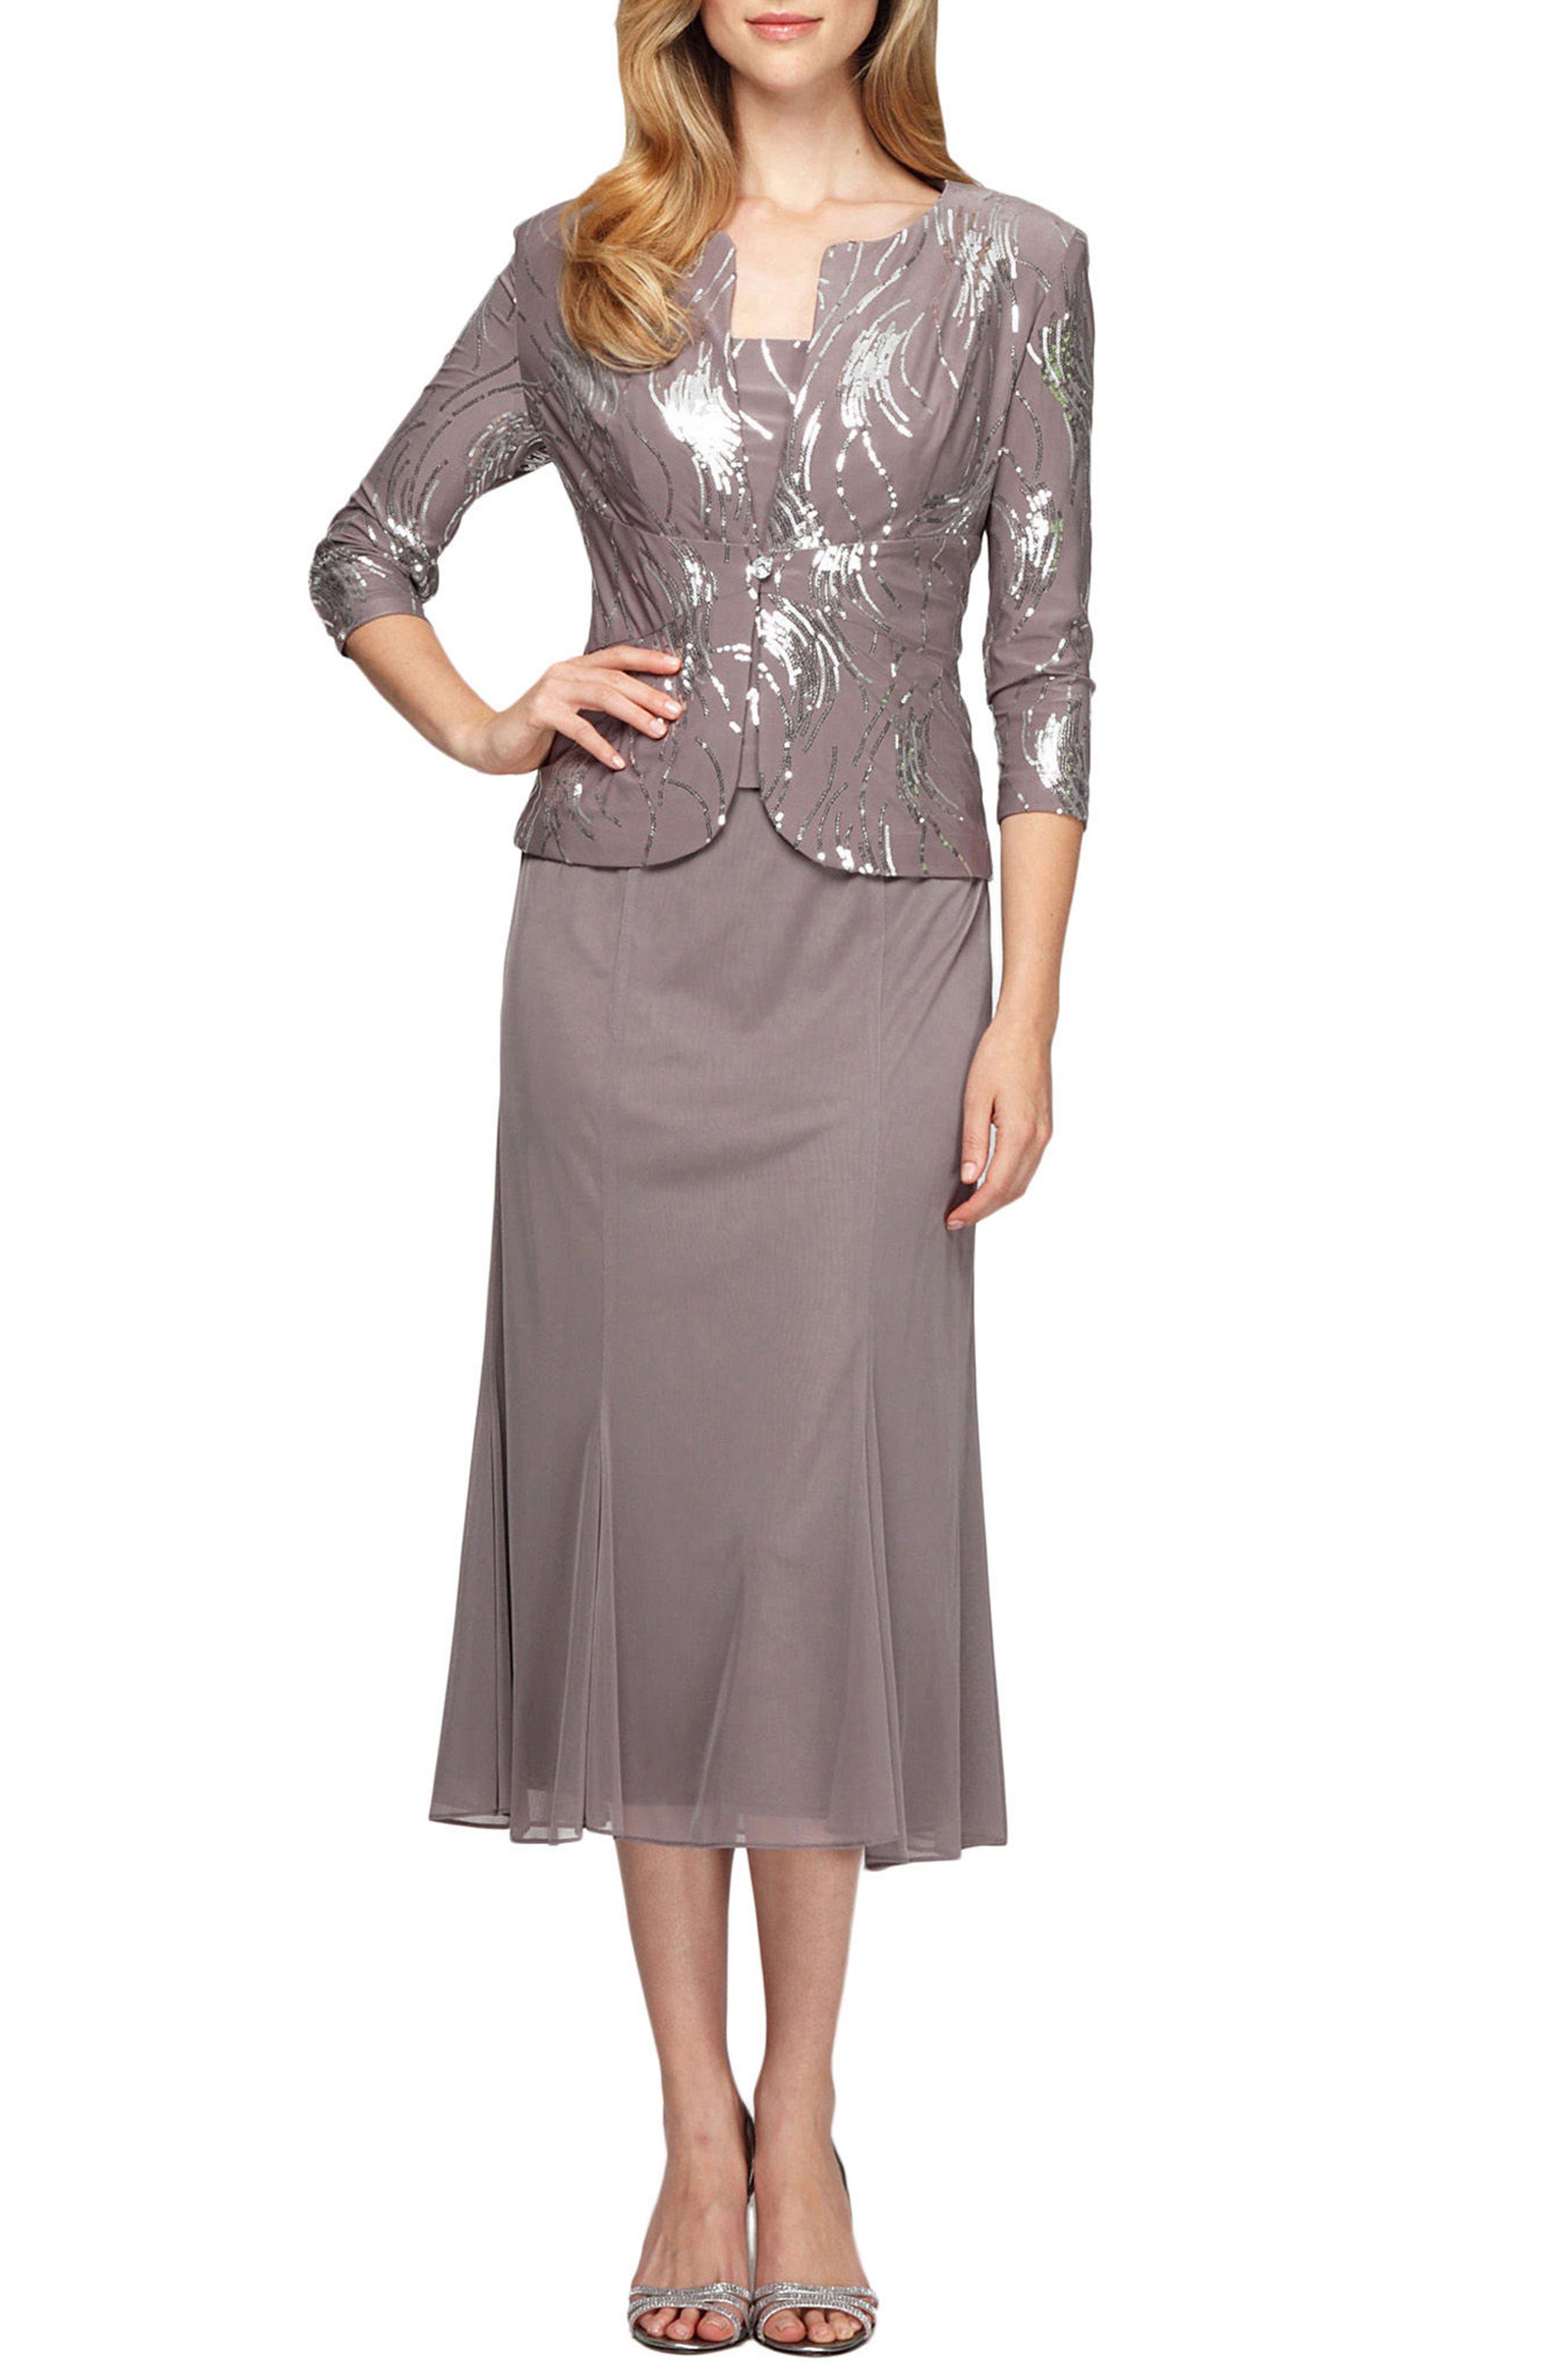 Alternate Image 1 Selected - Alex Evenings Midi Dress & Jacket (Regular & Petite)